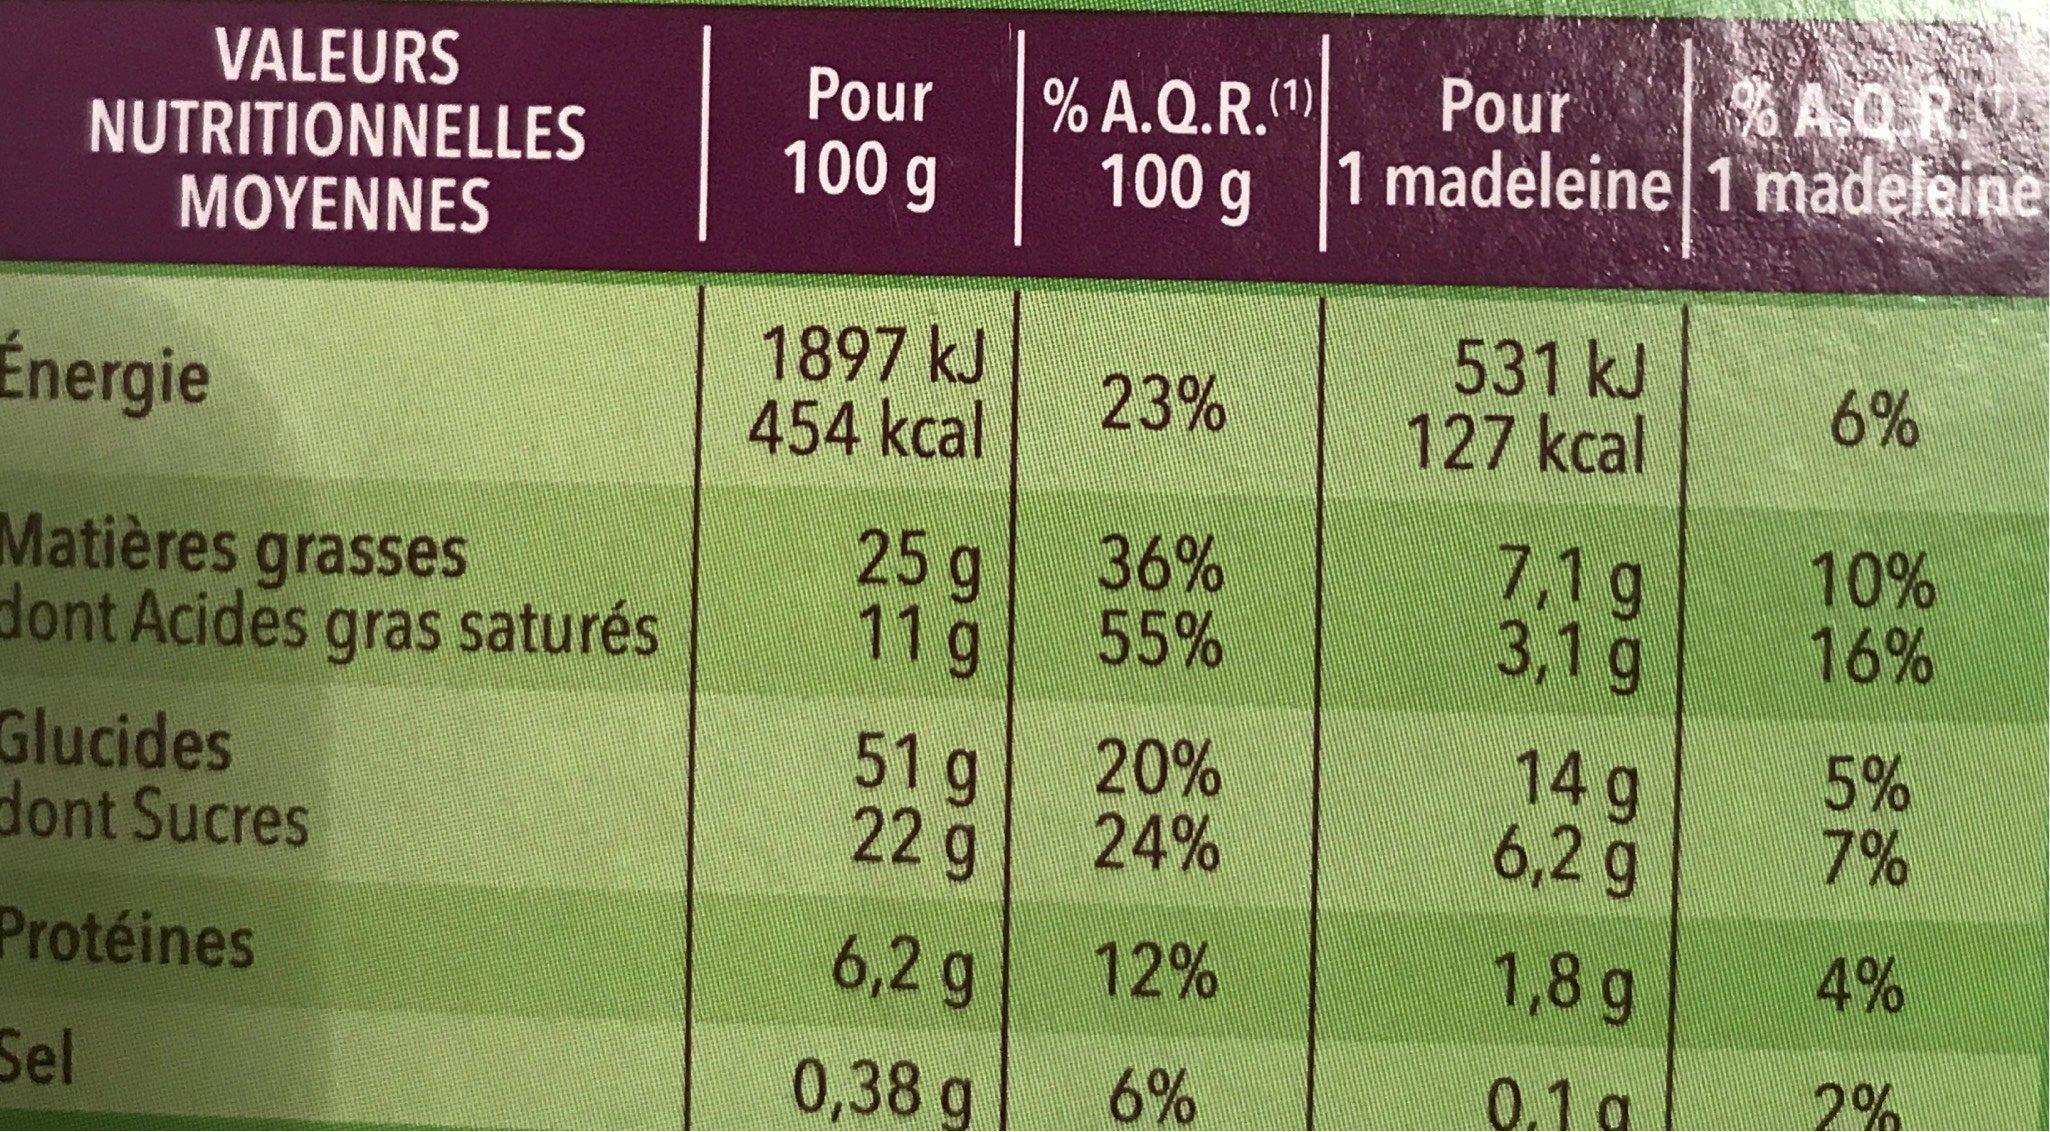 Madeleine saveur citron - Nutrition facts